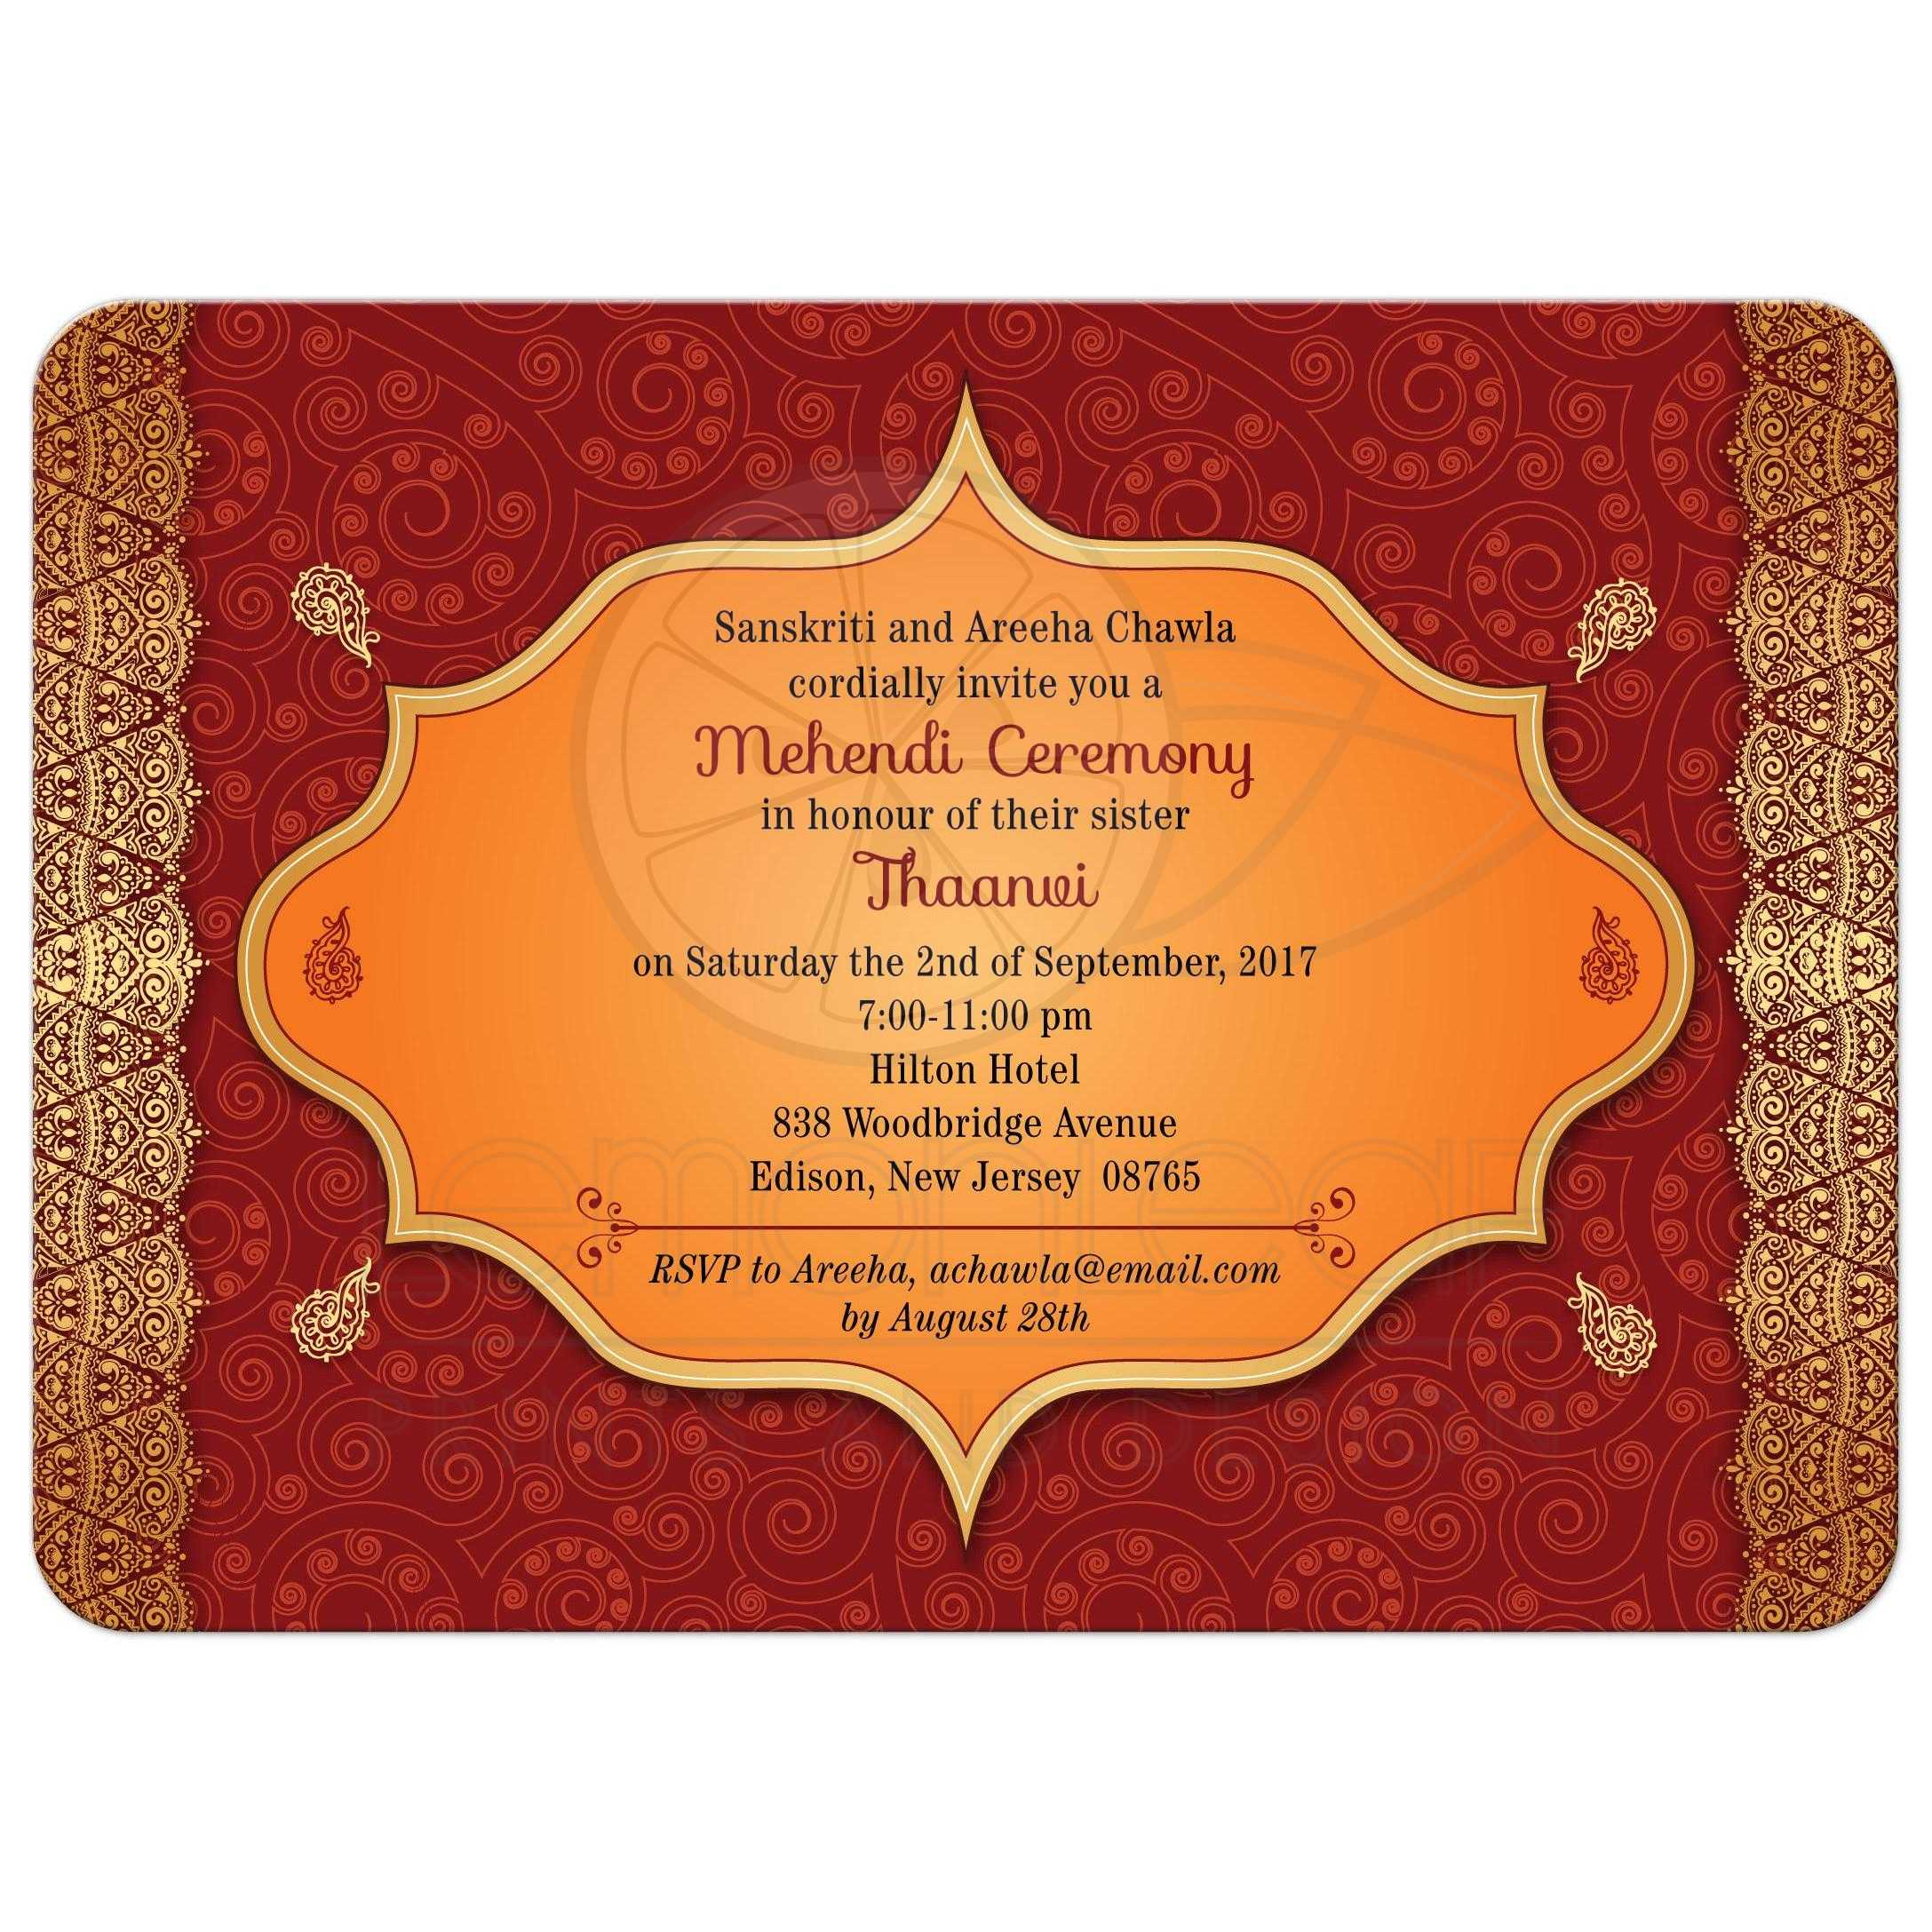 Party Invitation Red Paisley Mehndi Ceremony Bridal Wedding Shower